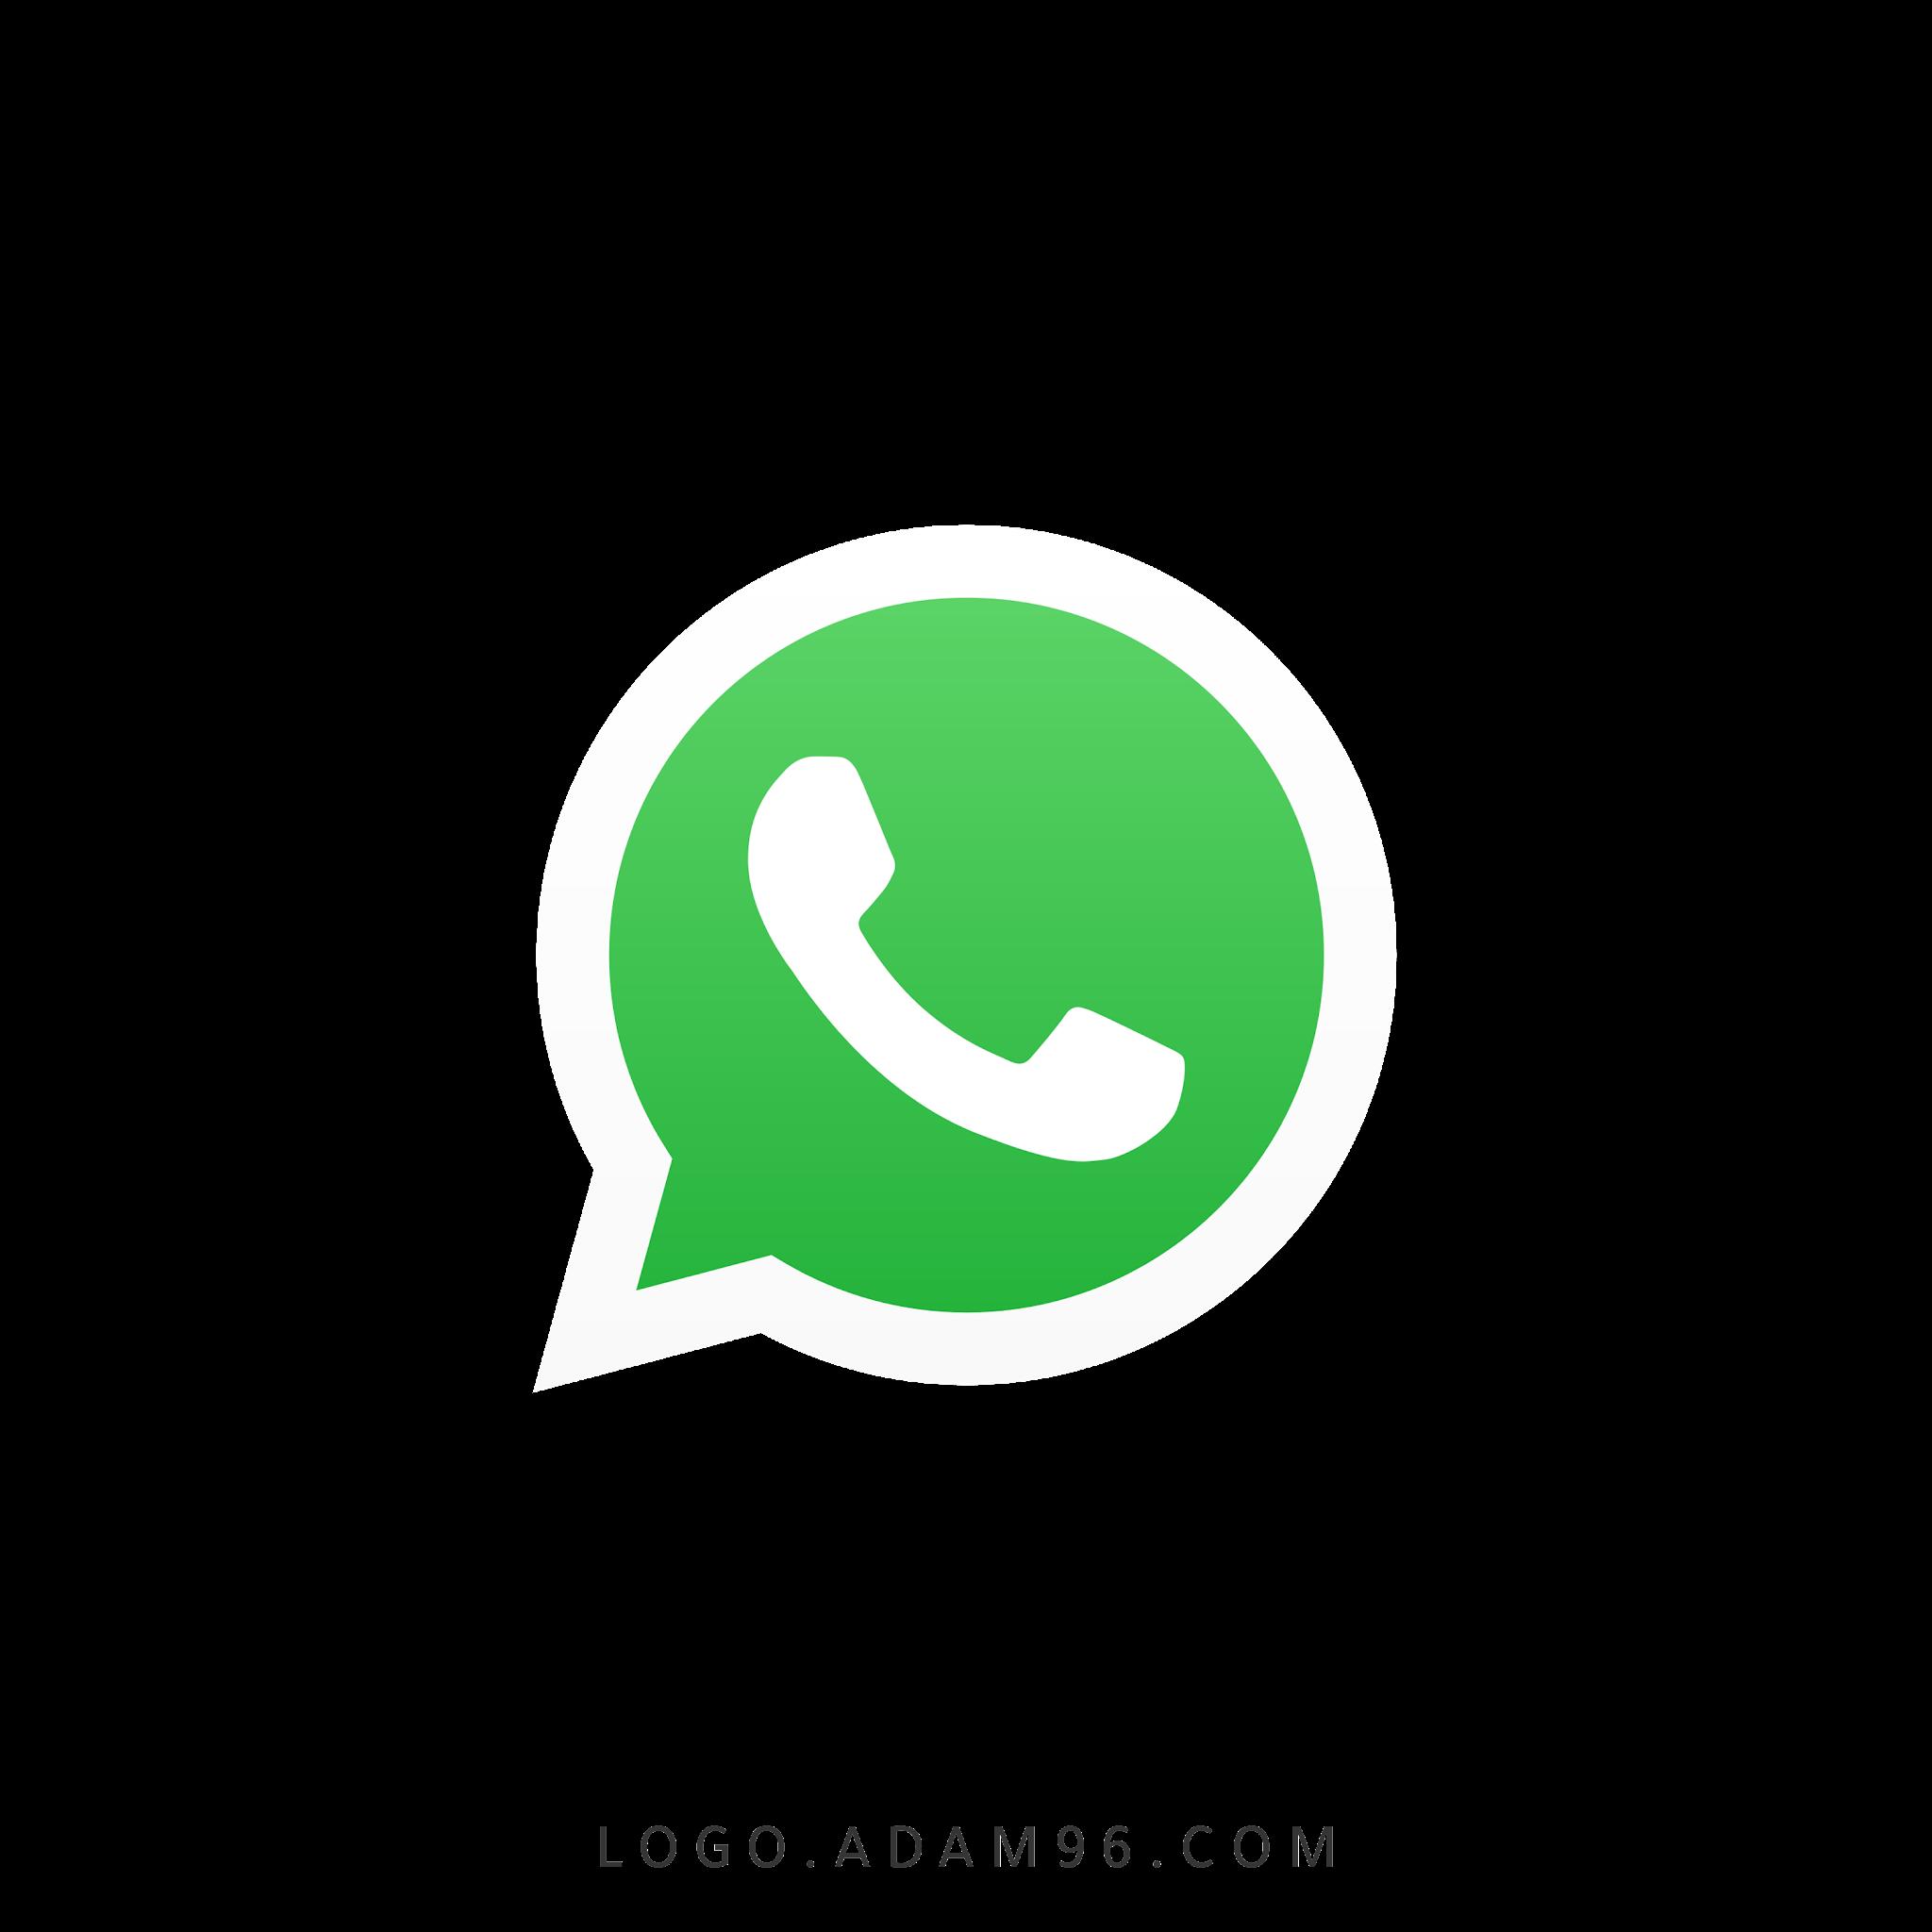 تحميل شعار واتساب الاصلي شفاف Logo WhatsApp PNG